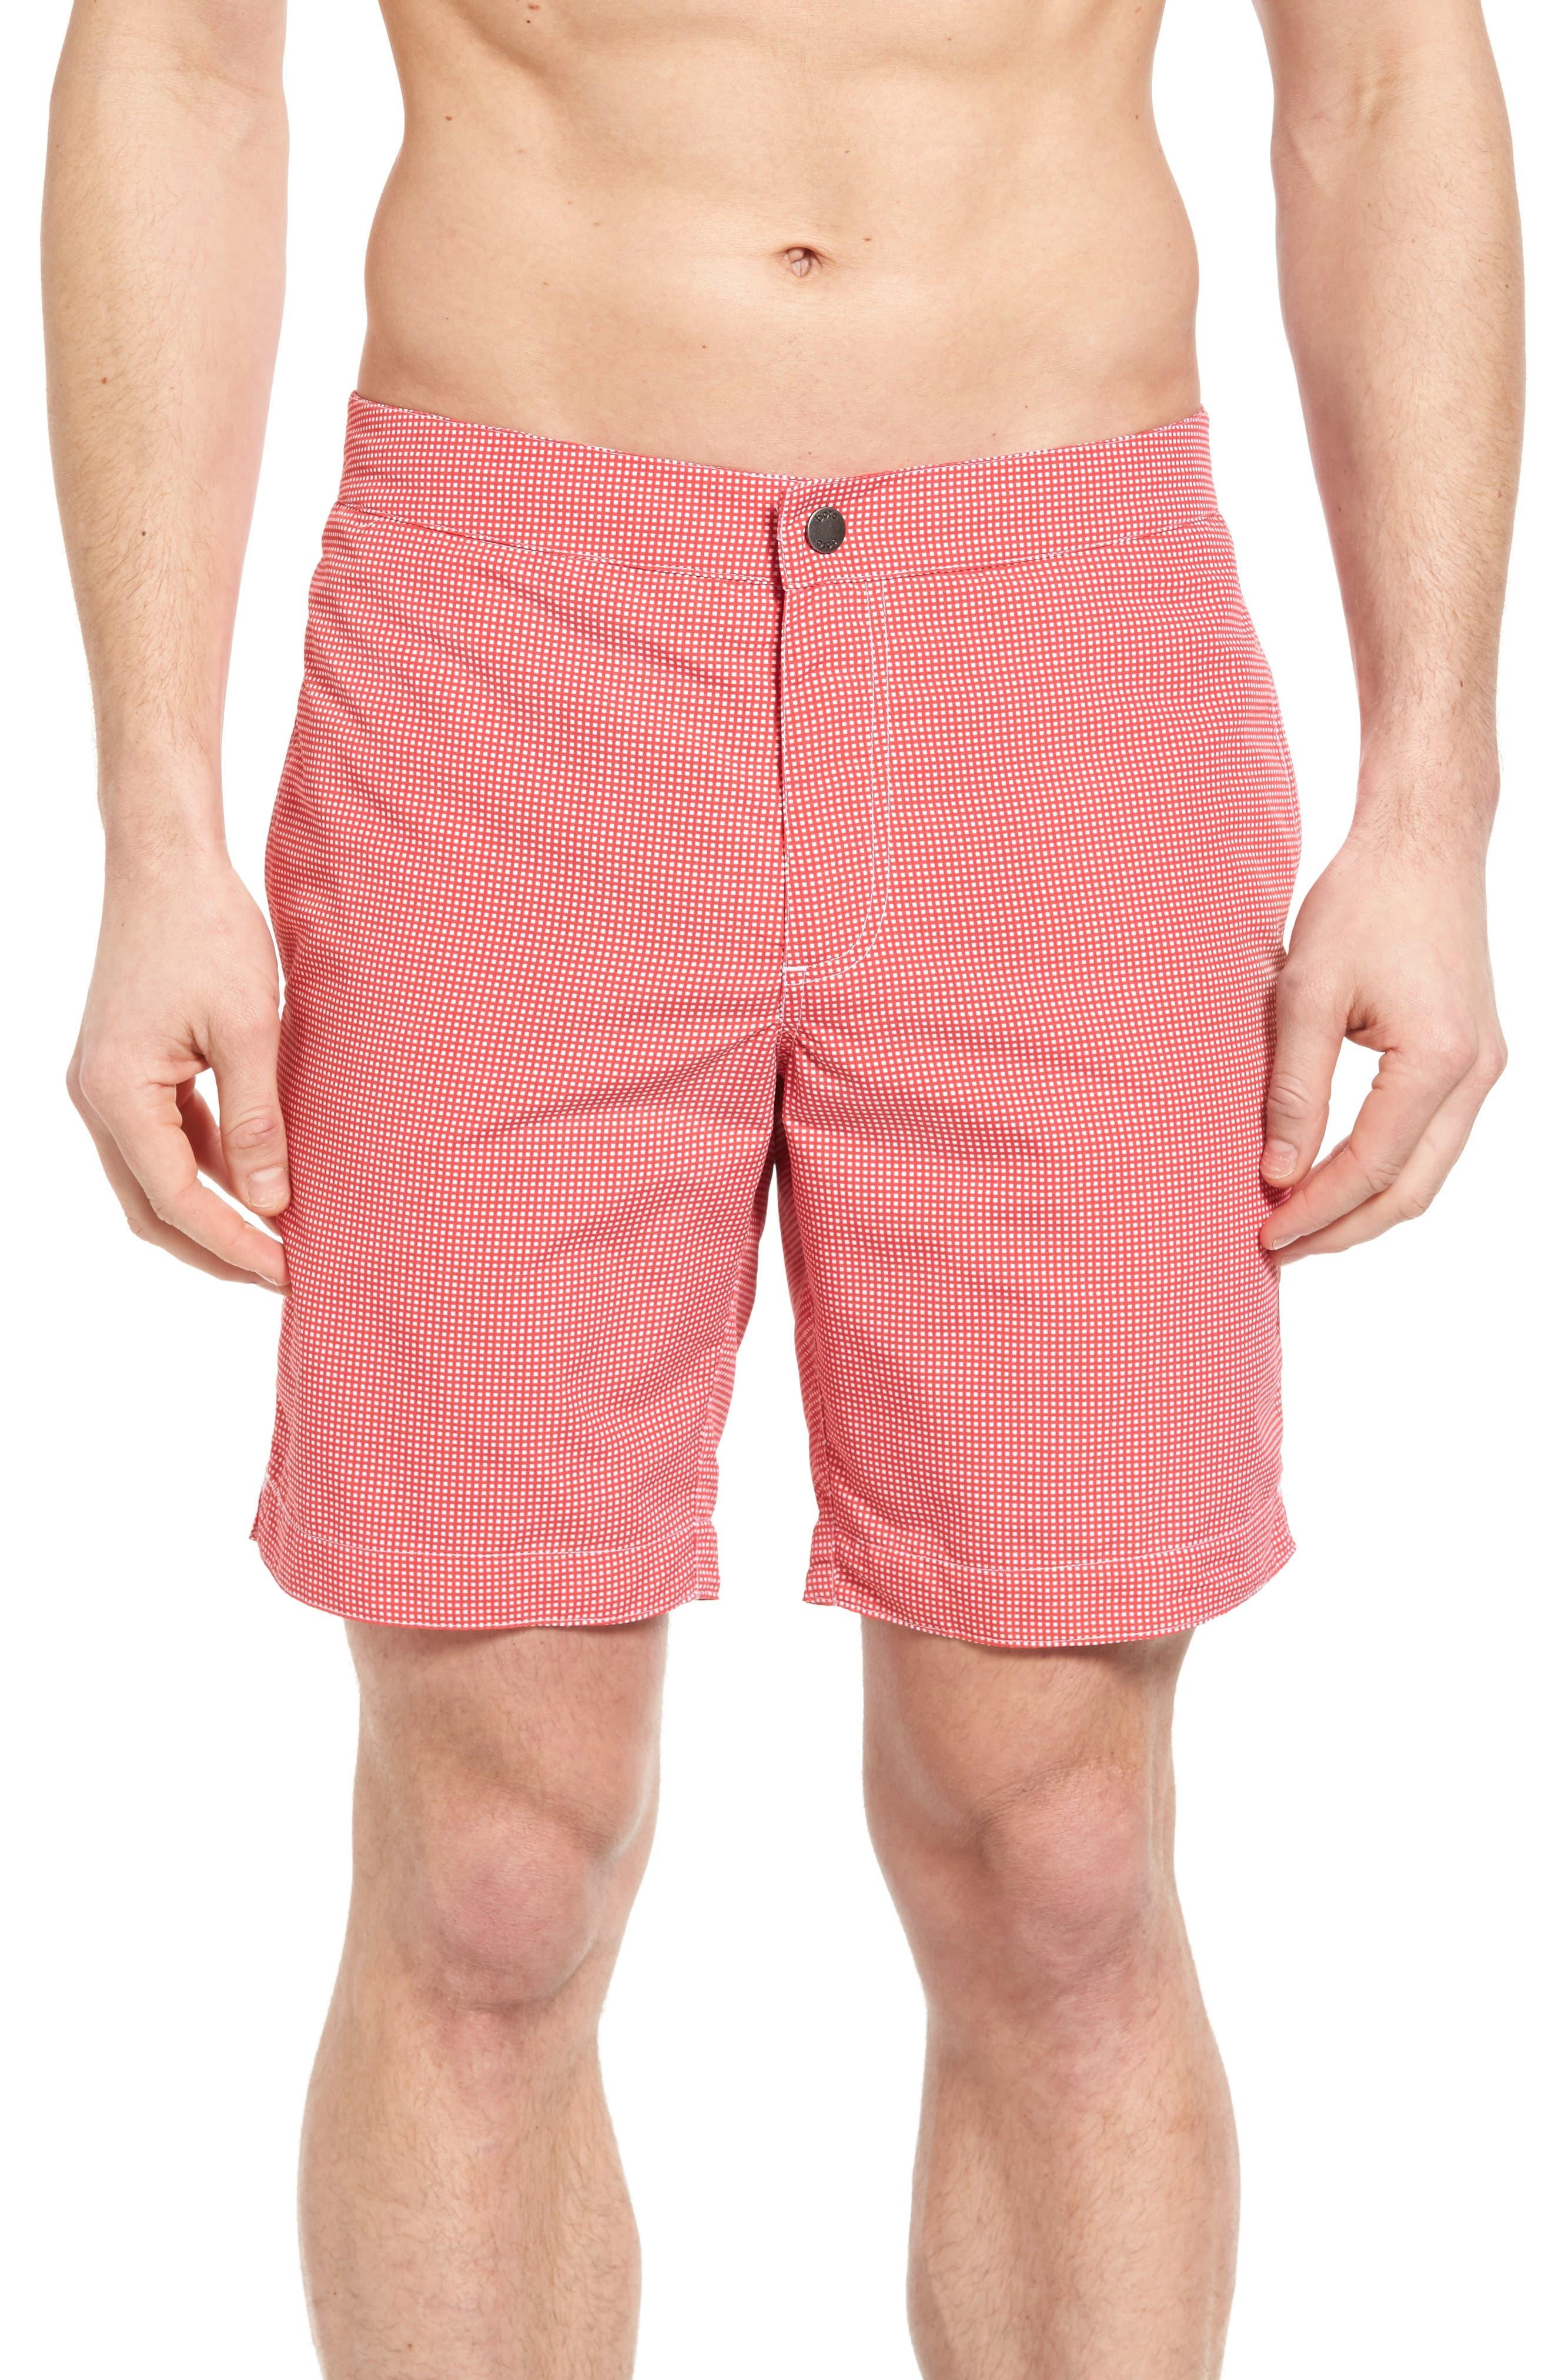 Aruba Microcheck Tailored Fit 8.5 Inch Swim Trunks,                             Main thumbnail 1, color,                             611